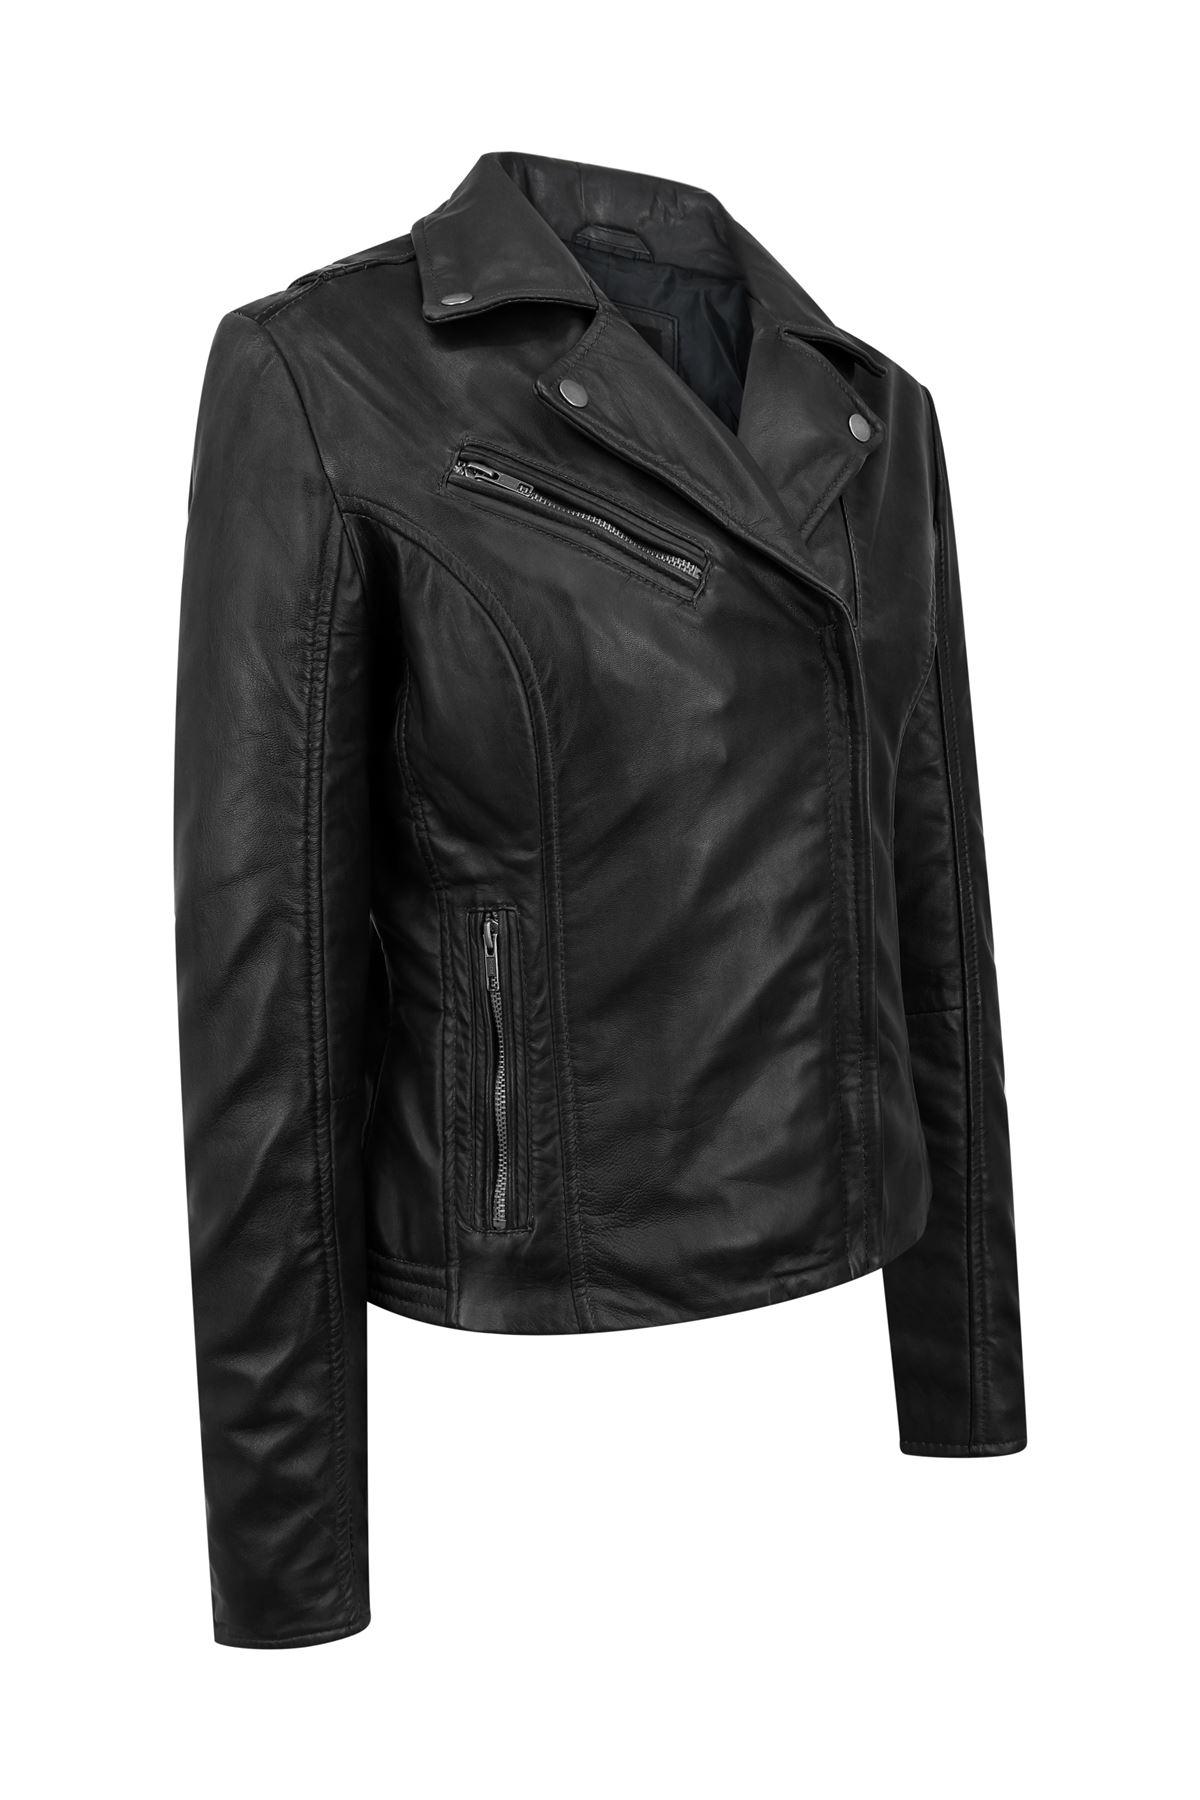 Blouson-femme-cuir-Napa-veritable-fermeture-zip-diagonale-ajuste miniature 7